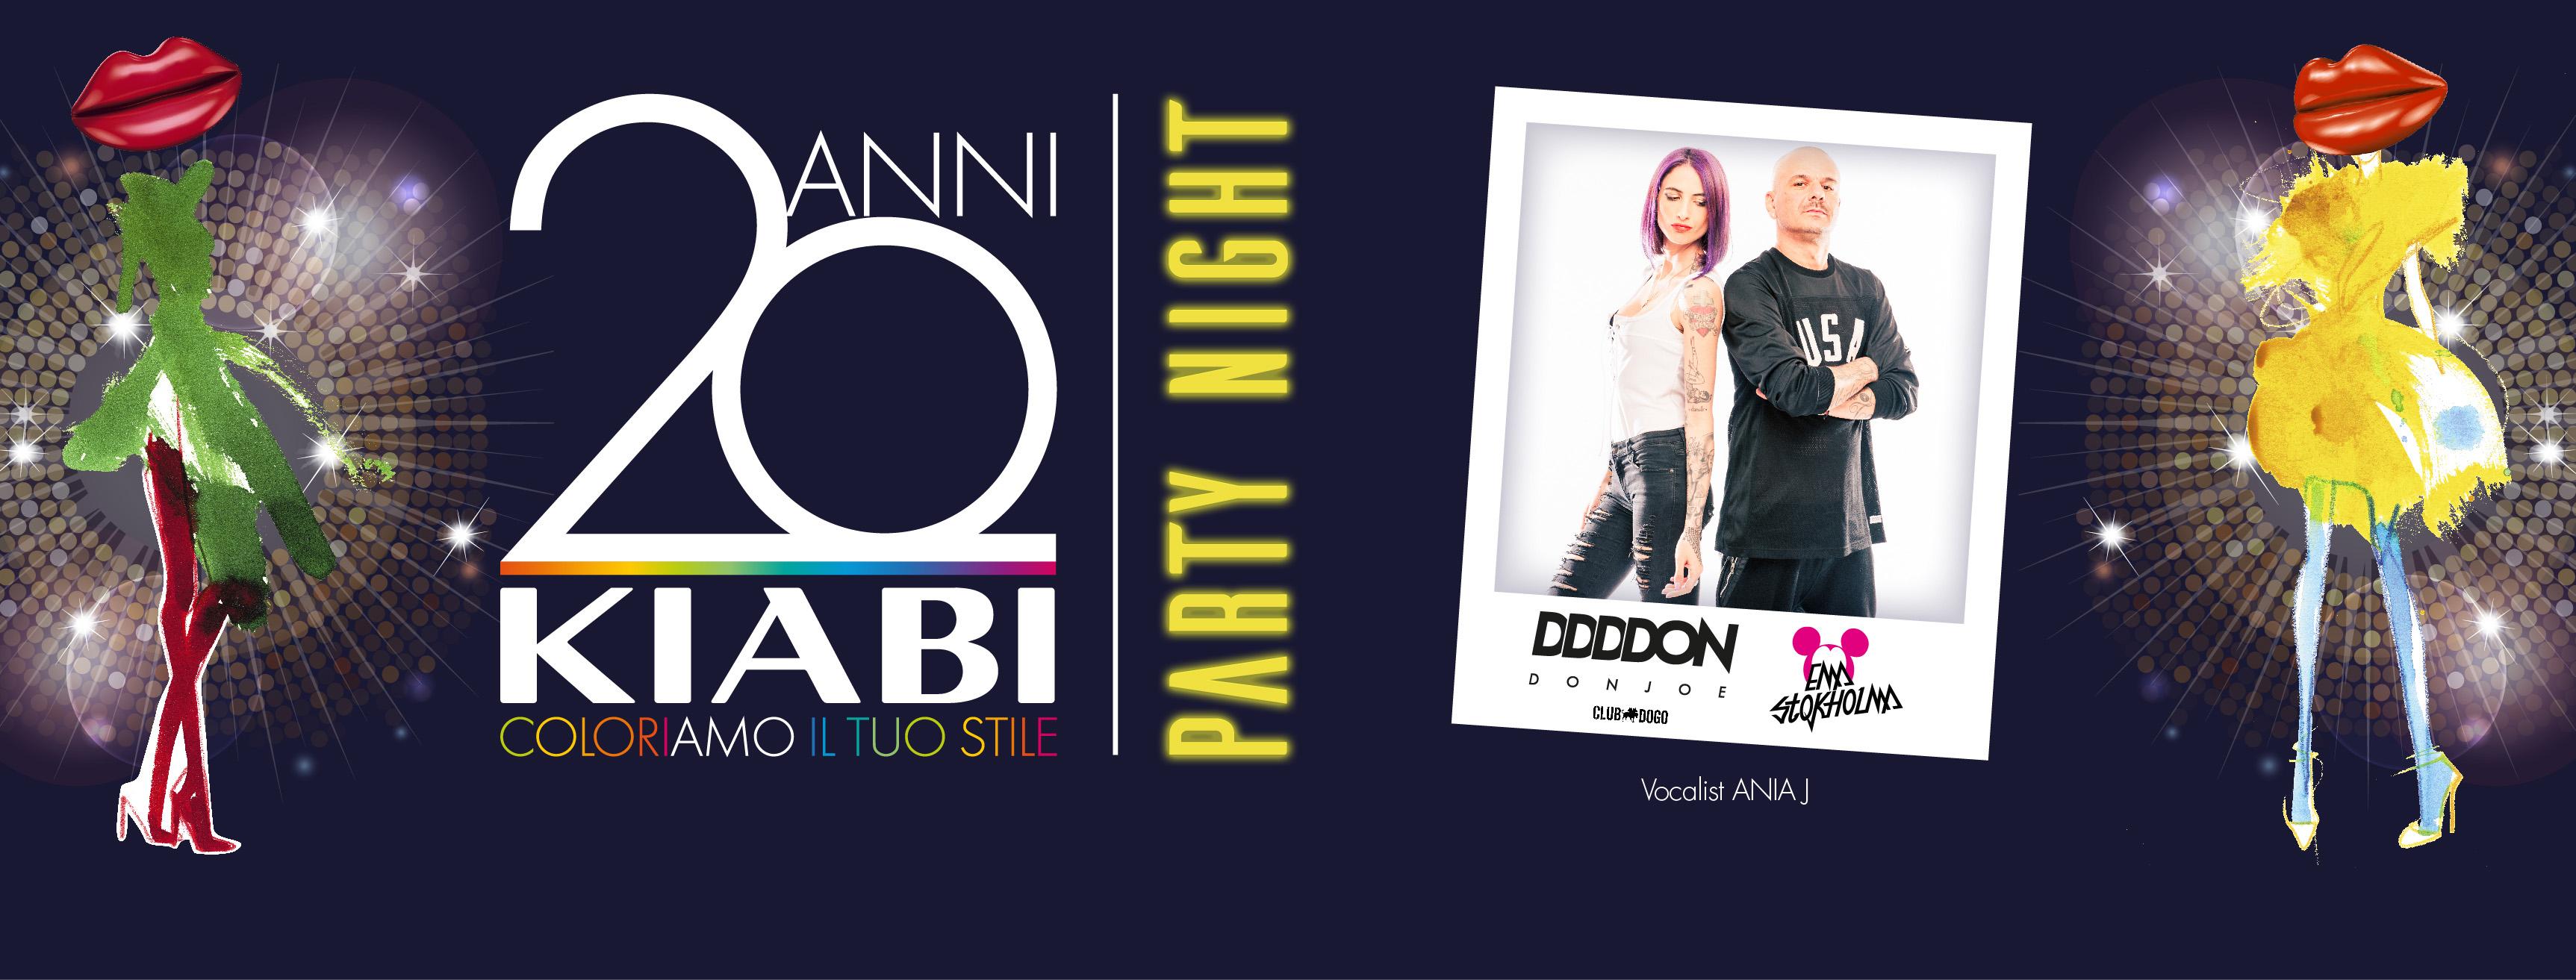 20 ANNI KIABI - Party Night Special Edition